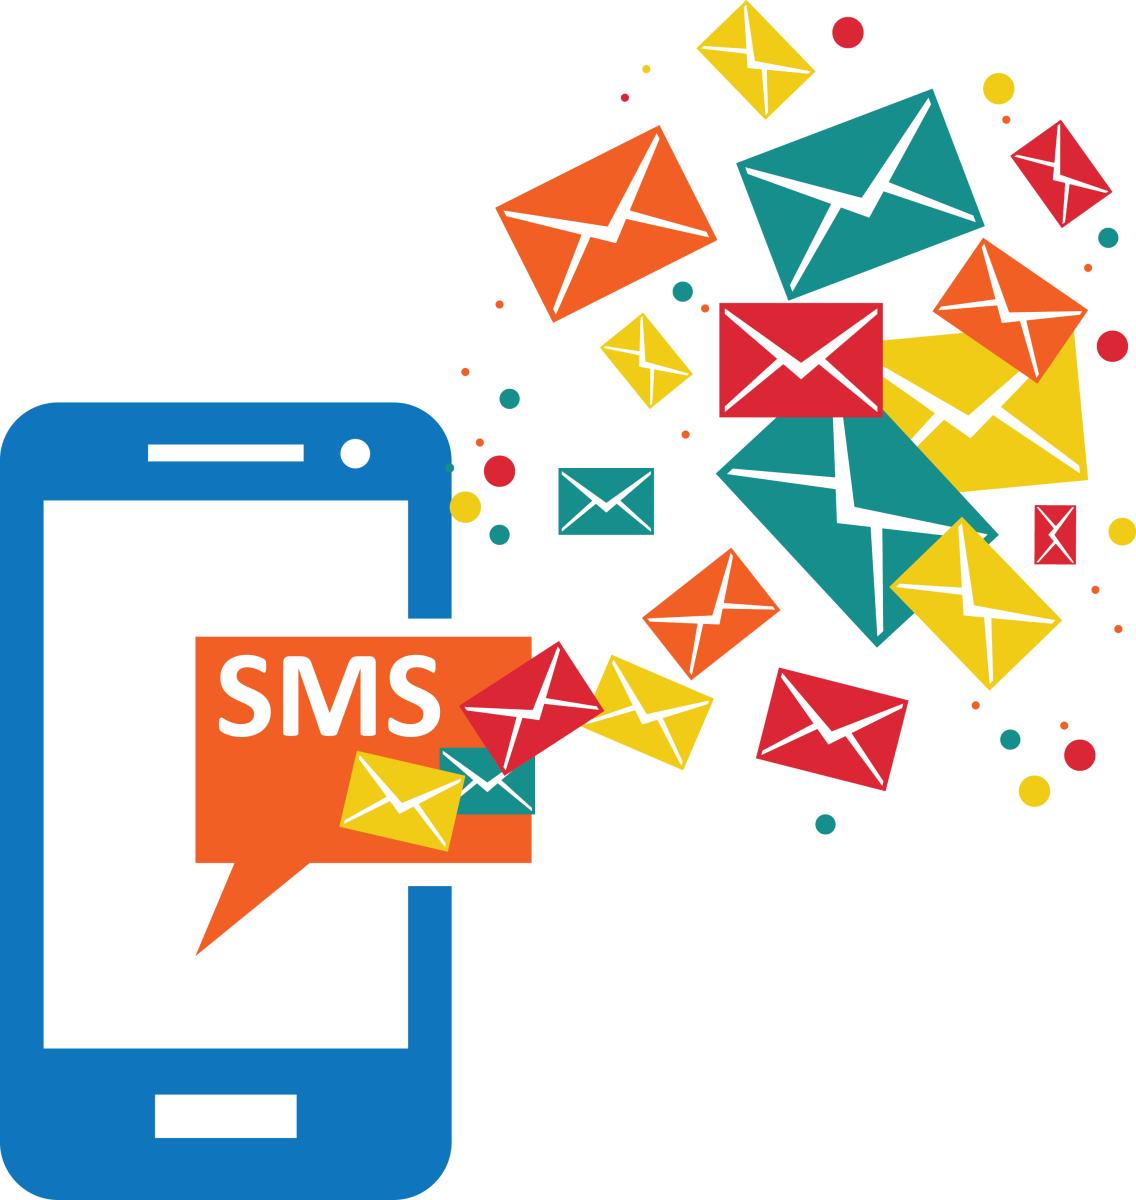 mua mã thẻ Vietcombank qua SMS